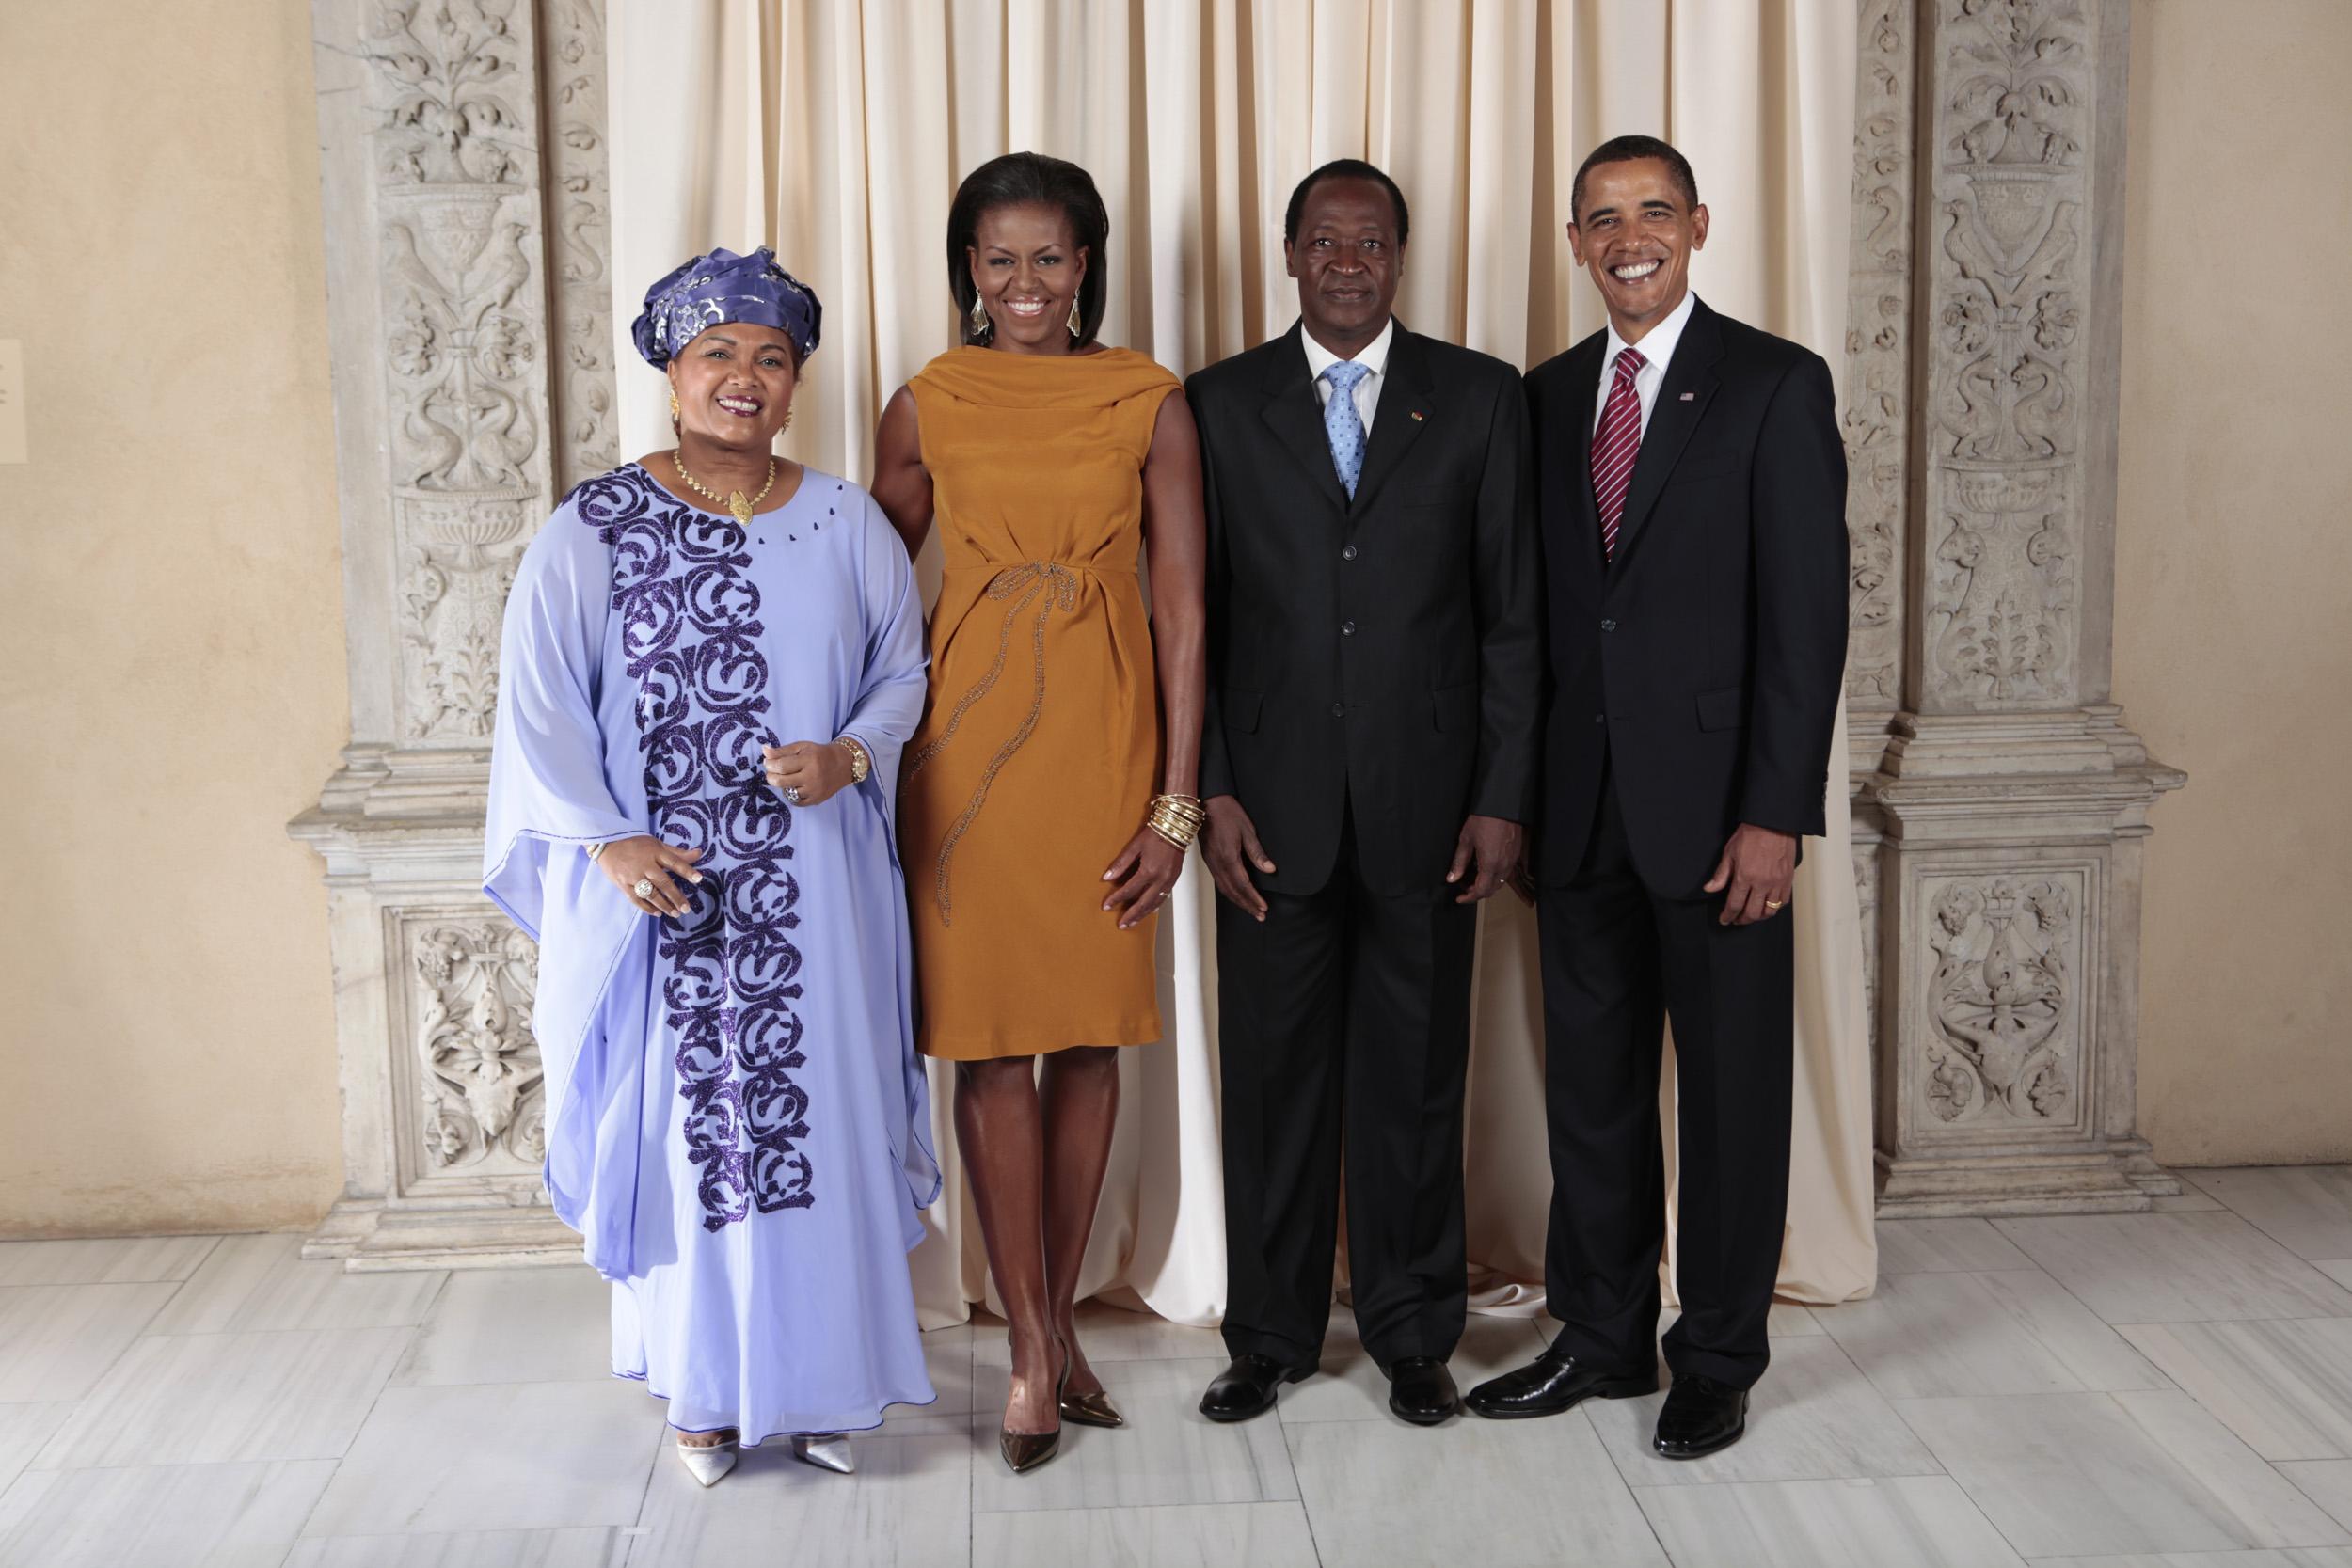 President Obama Dress Shoes